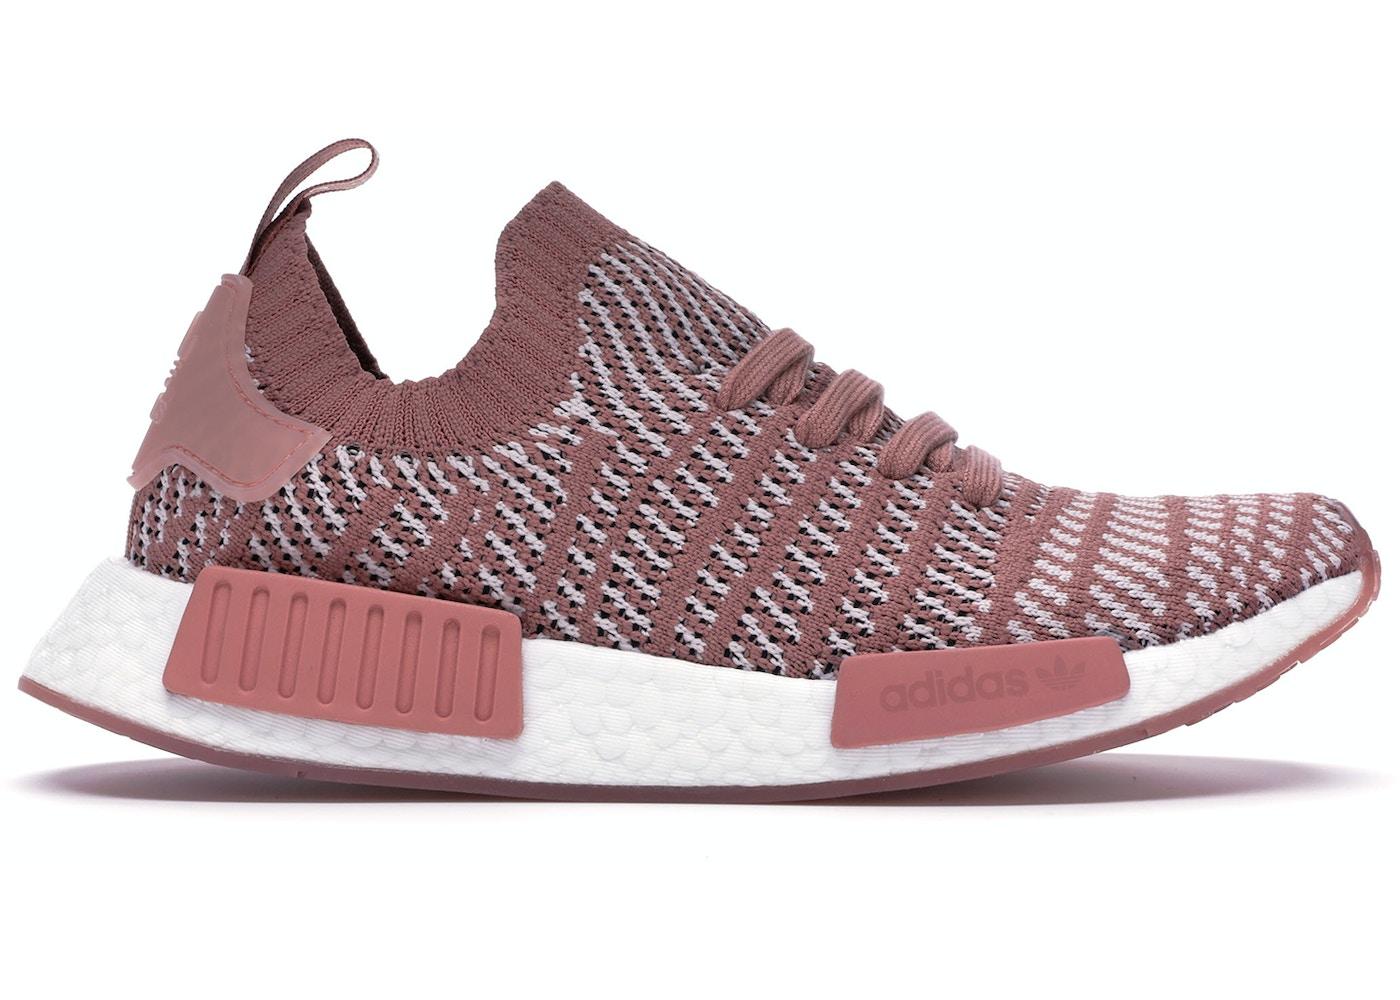 3a443dc86b6e R1 Shoes - New Highest Bids